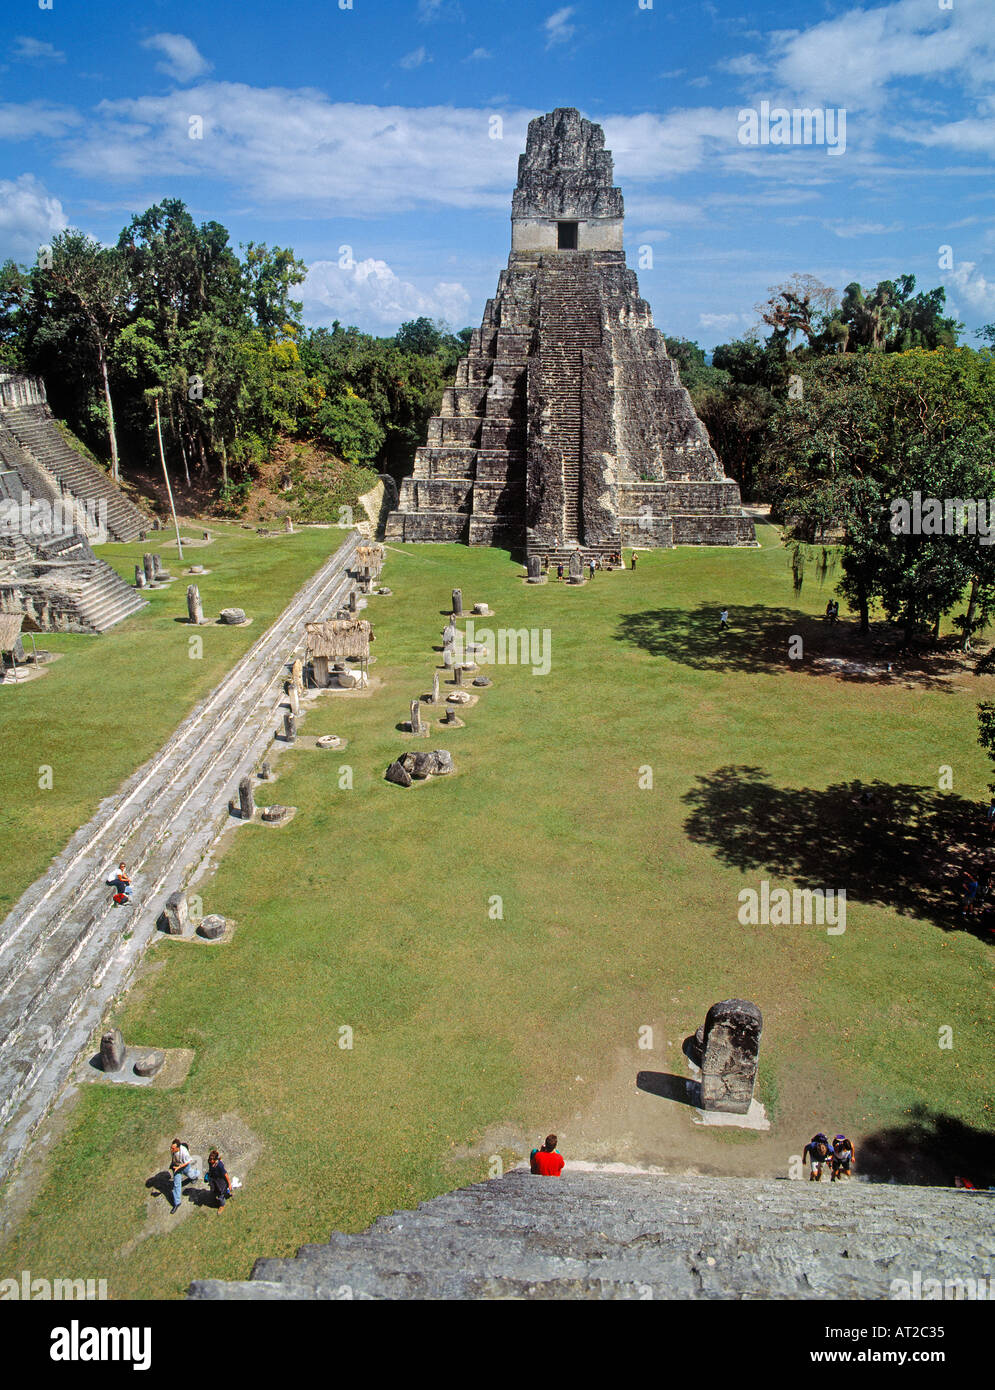 Tikal Mayan Ruins Peten Department Guatemala Temple 1 Temple of the Jaguar - Stock Image